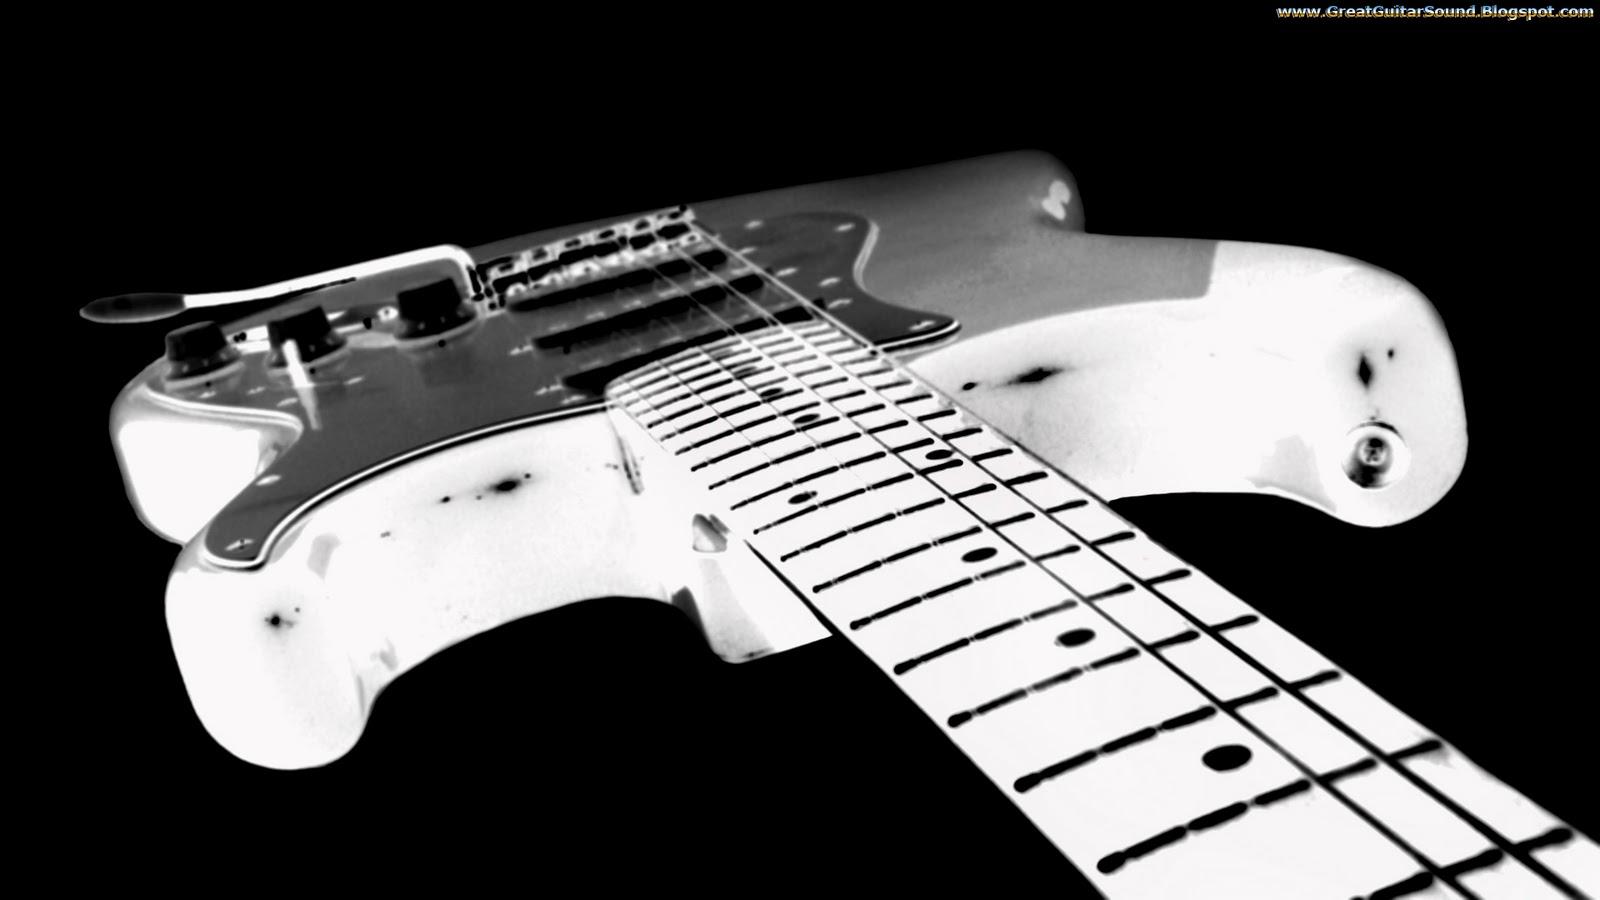 Yamaha Guitars Wallpapers